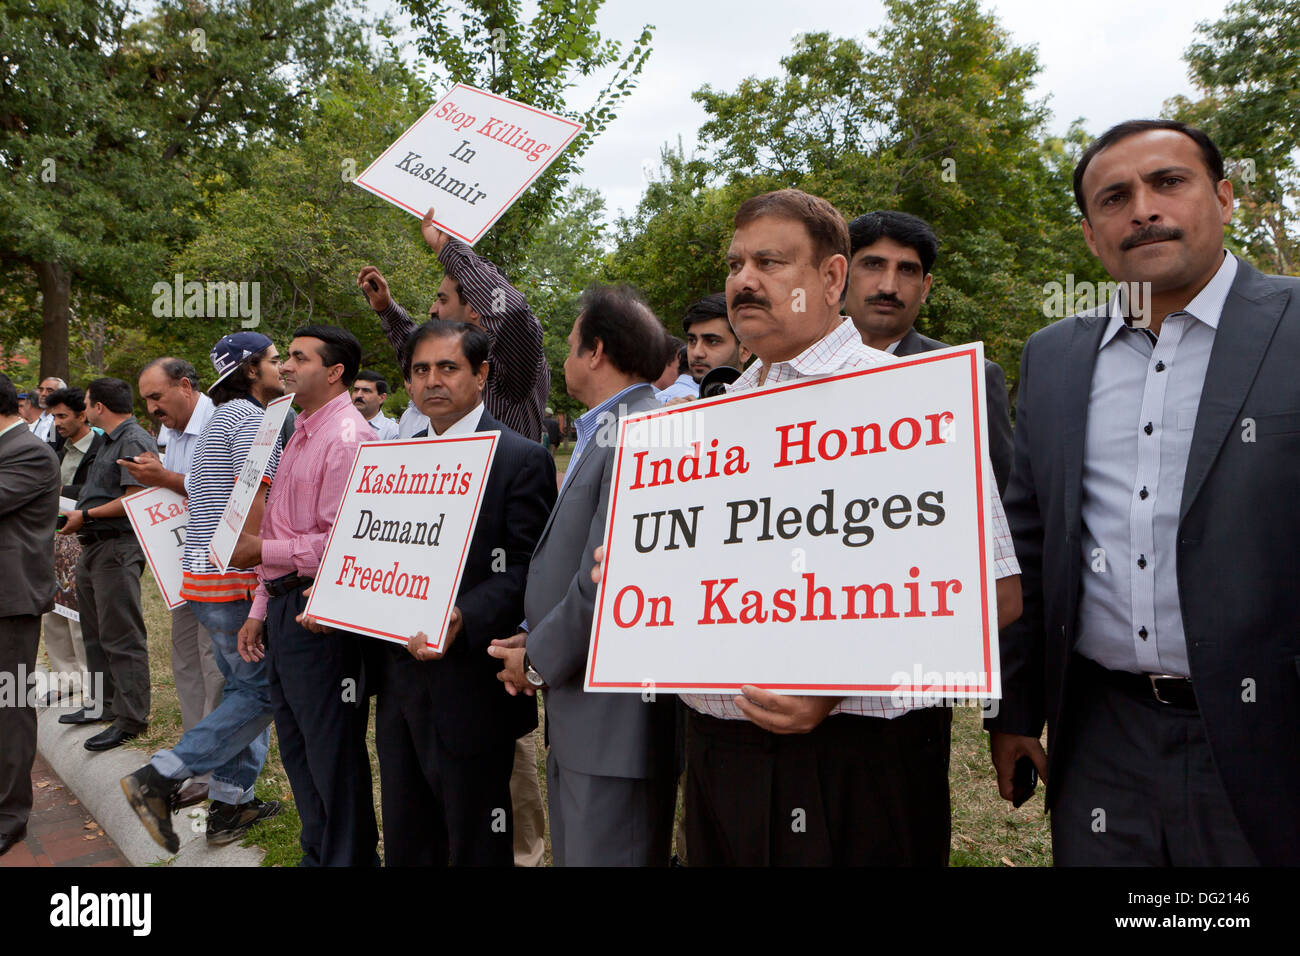 Kashmiri-Americans protest against Indian government - Washington, DC USA - Stock Image